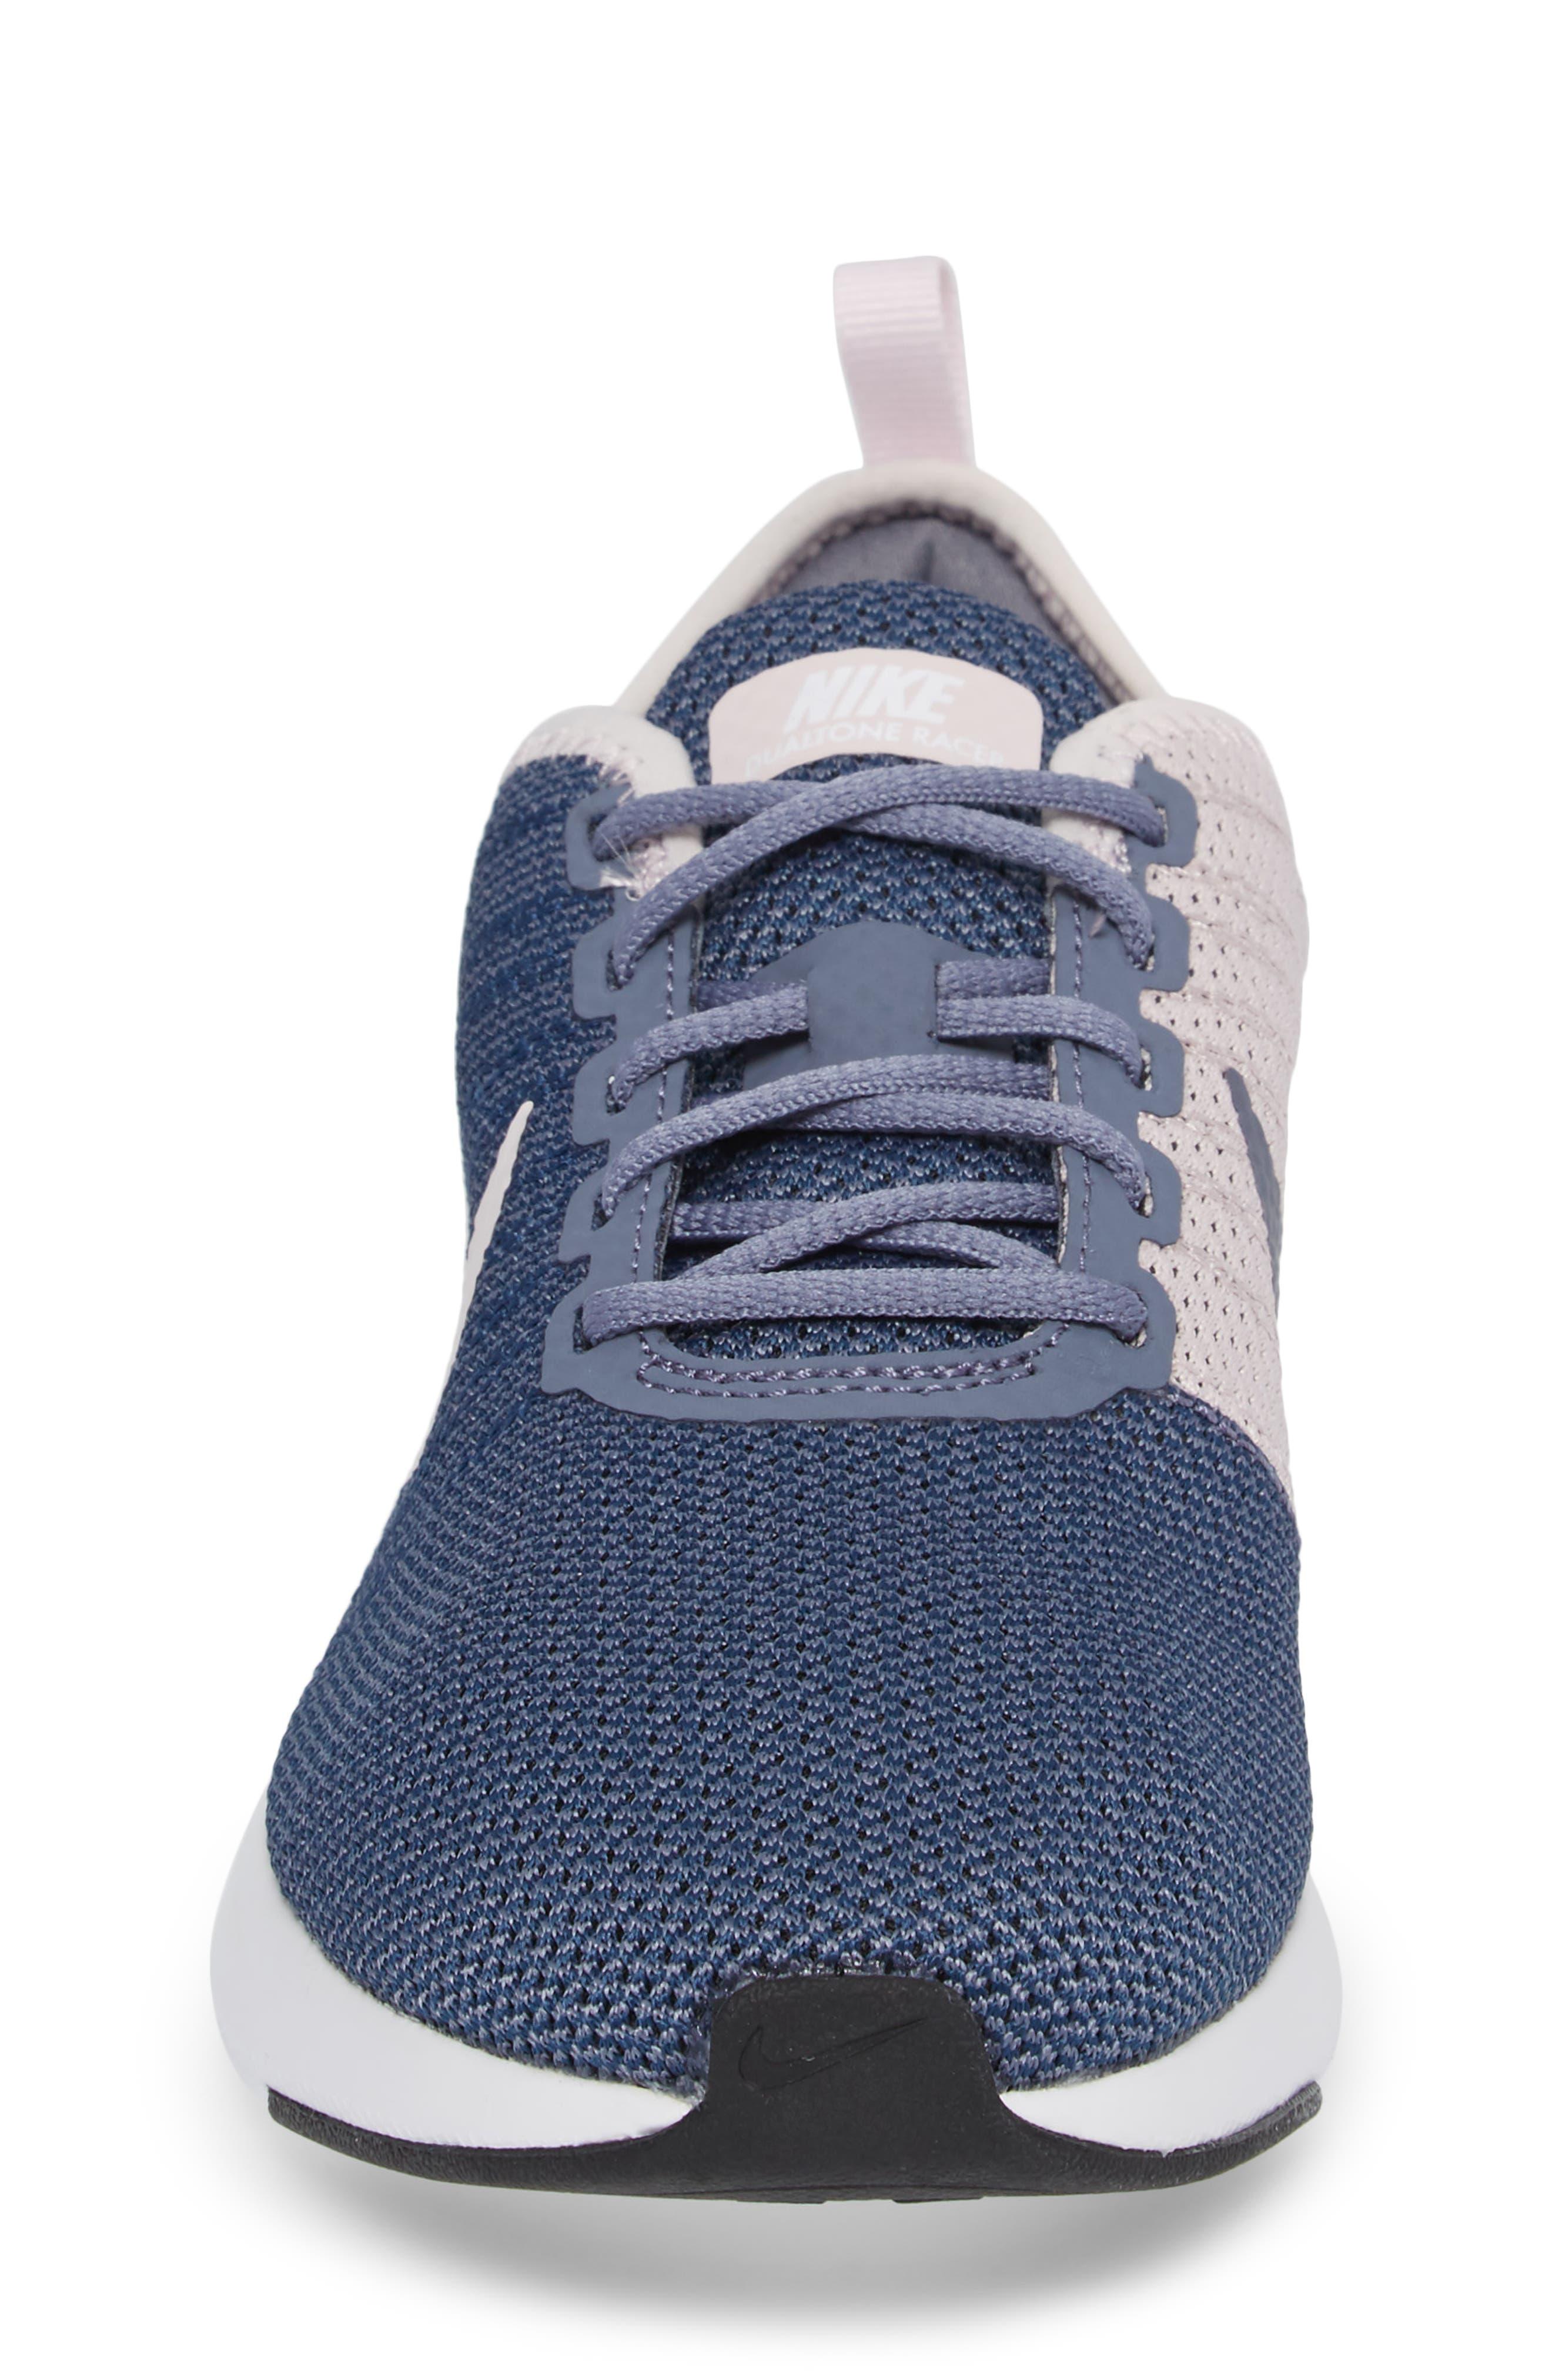 Dualtone Racer GS Sneaker,                             Alternate thumbnail 4, color,                             020